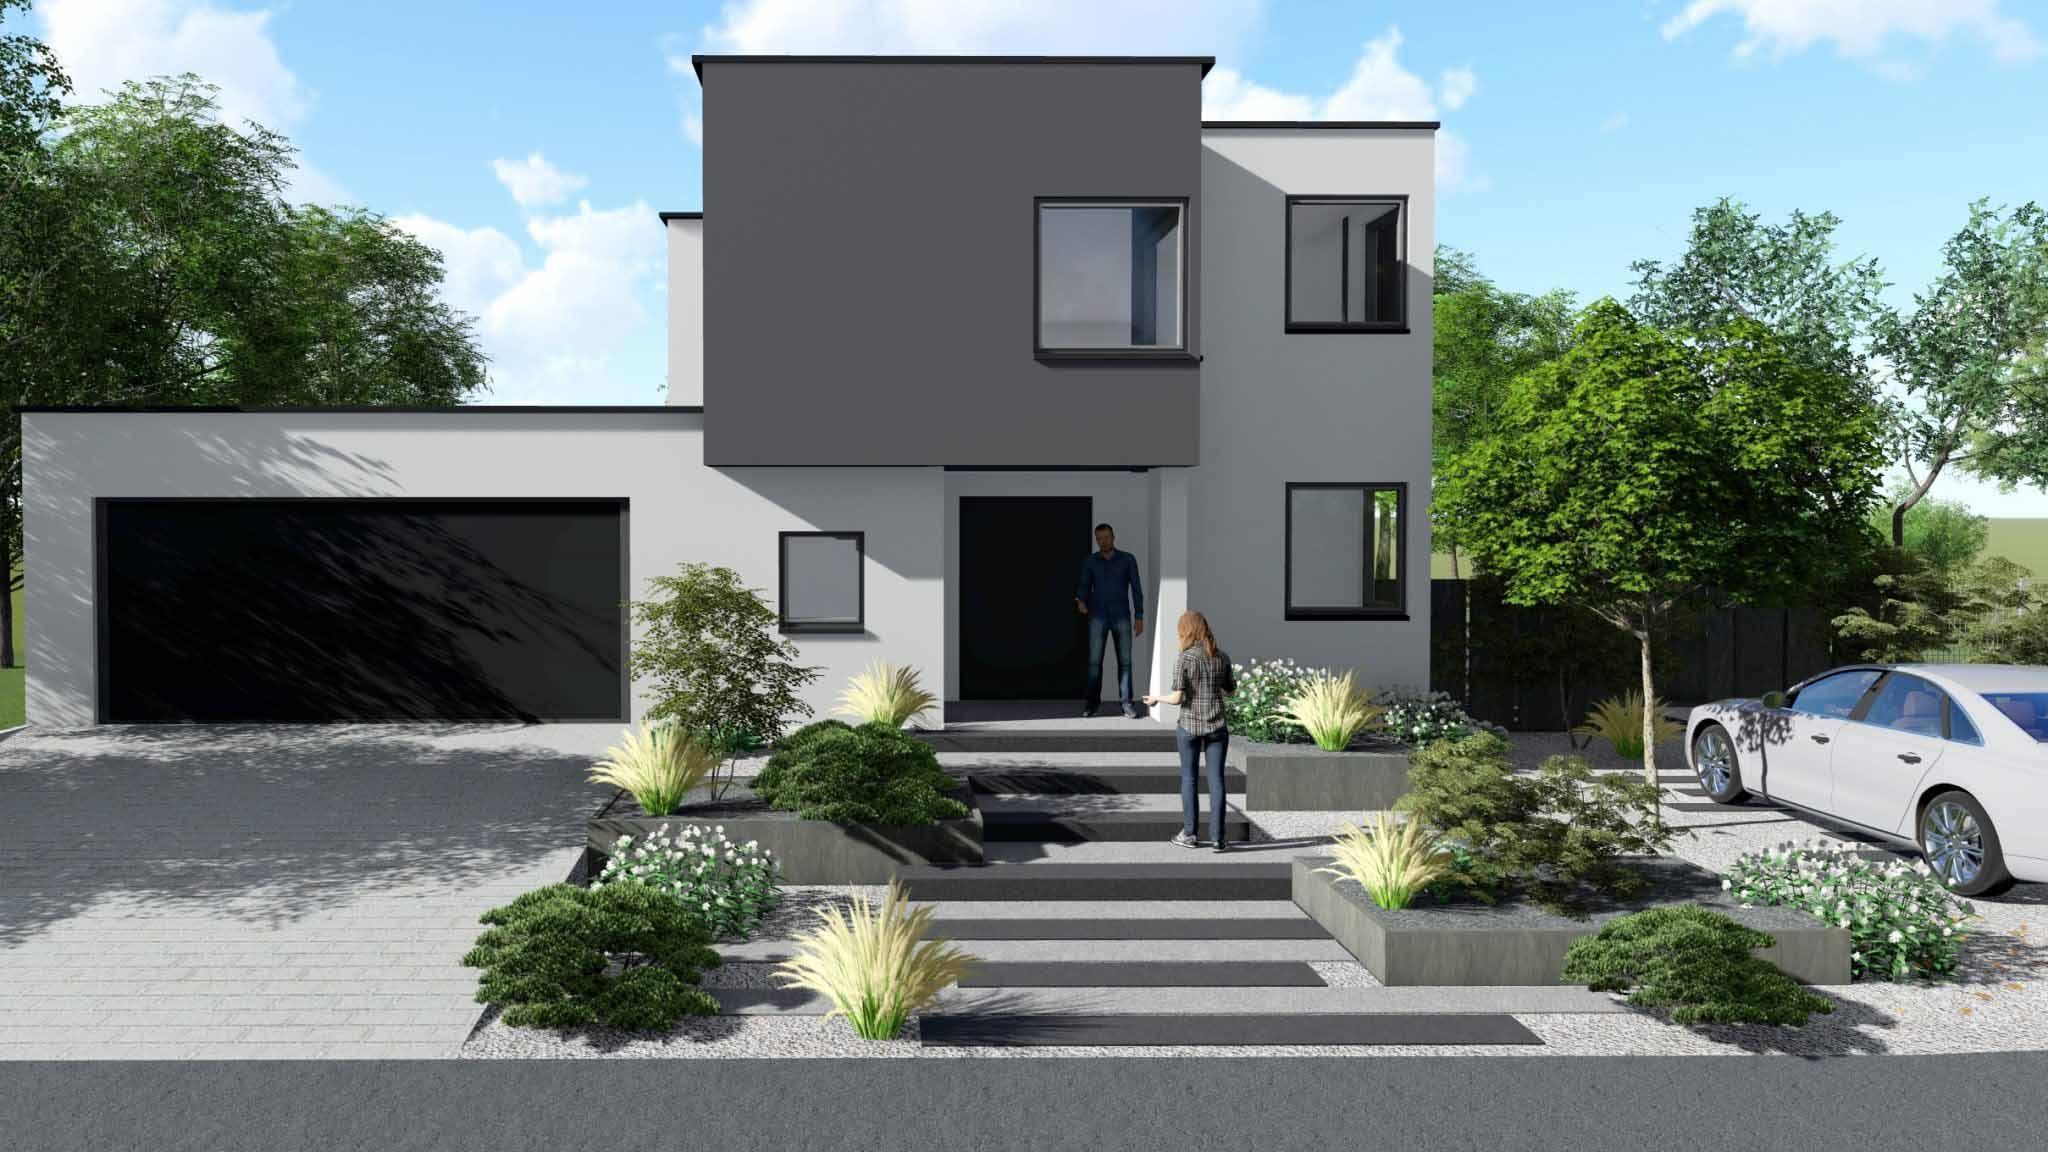 Architecte paysagiste image 3D jardin